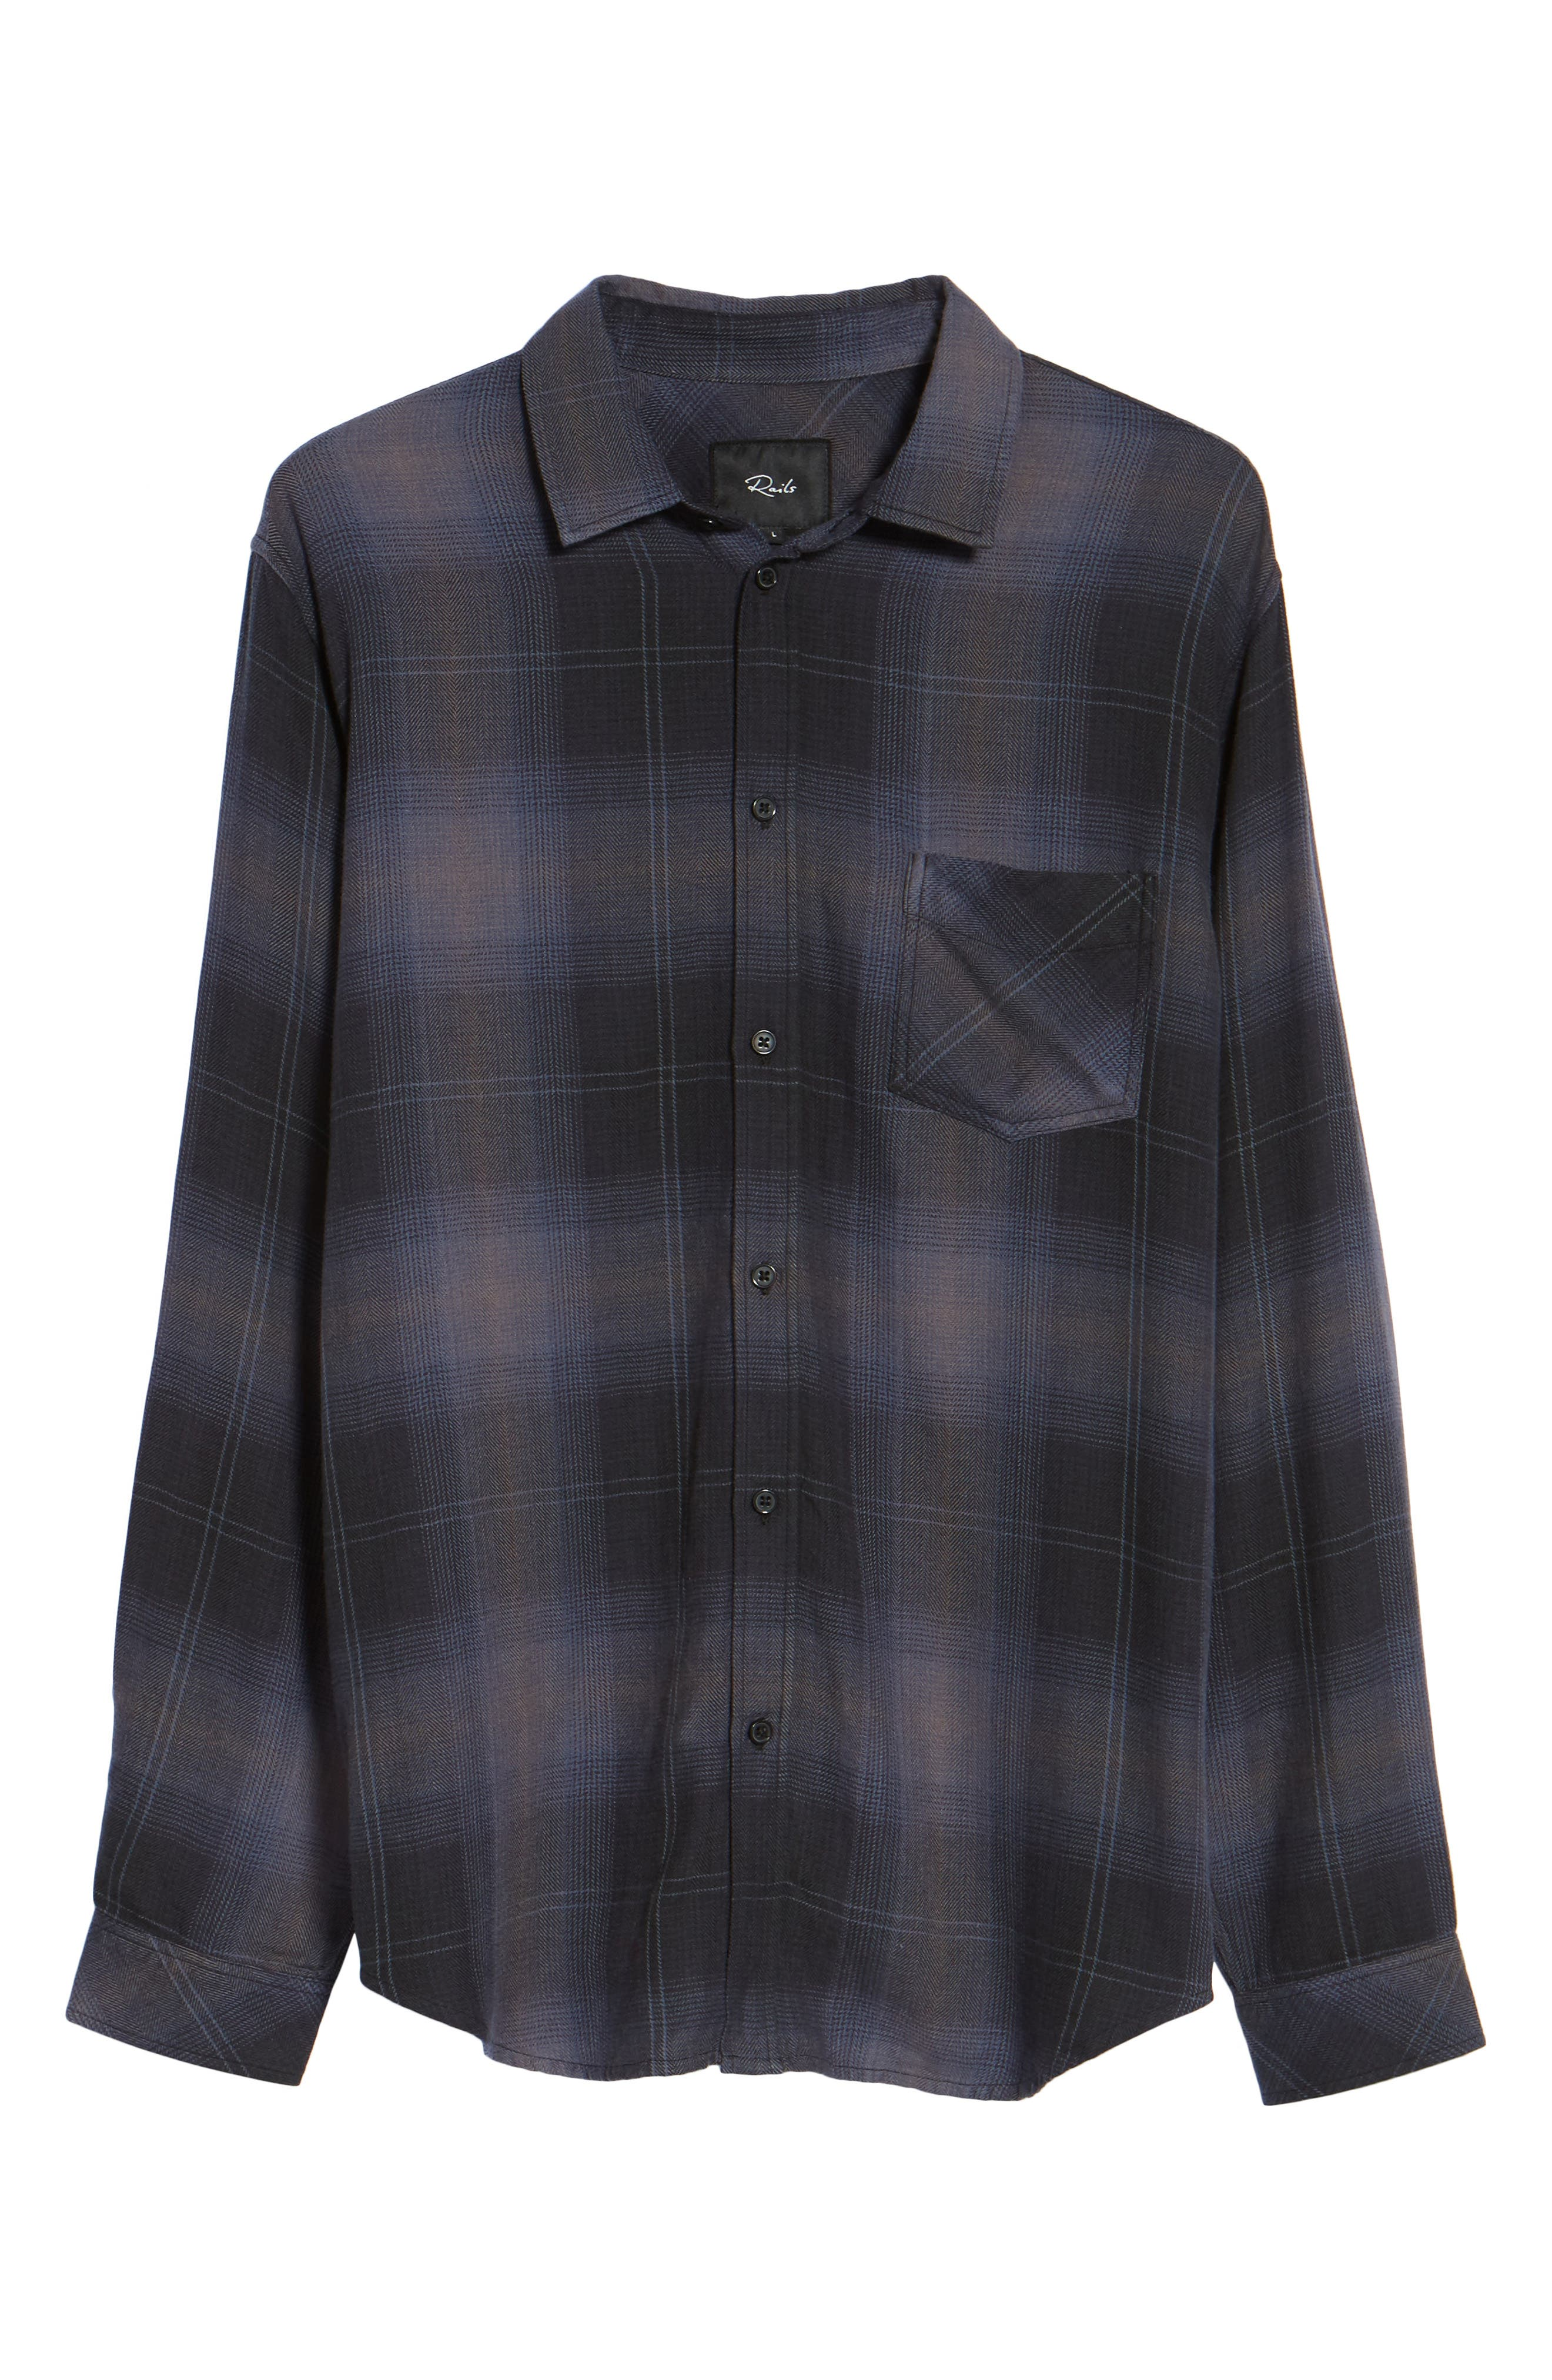 Lennox Sport Shirt,                             Alternate thumbnail 6, color,                             CHARCOAL/ BLACK